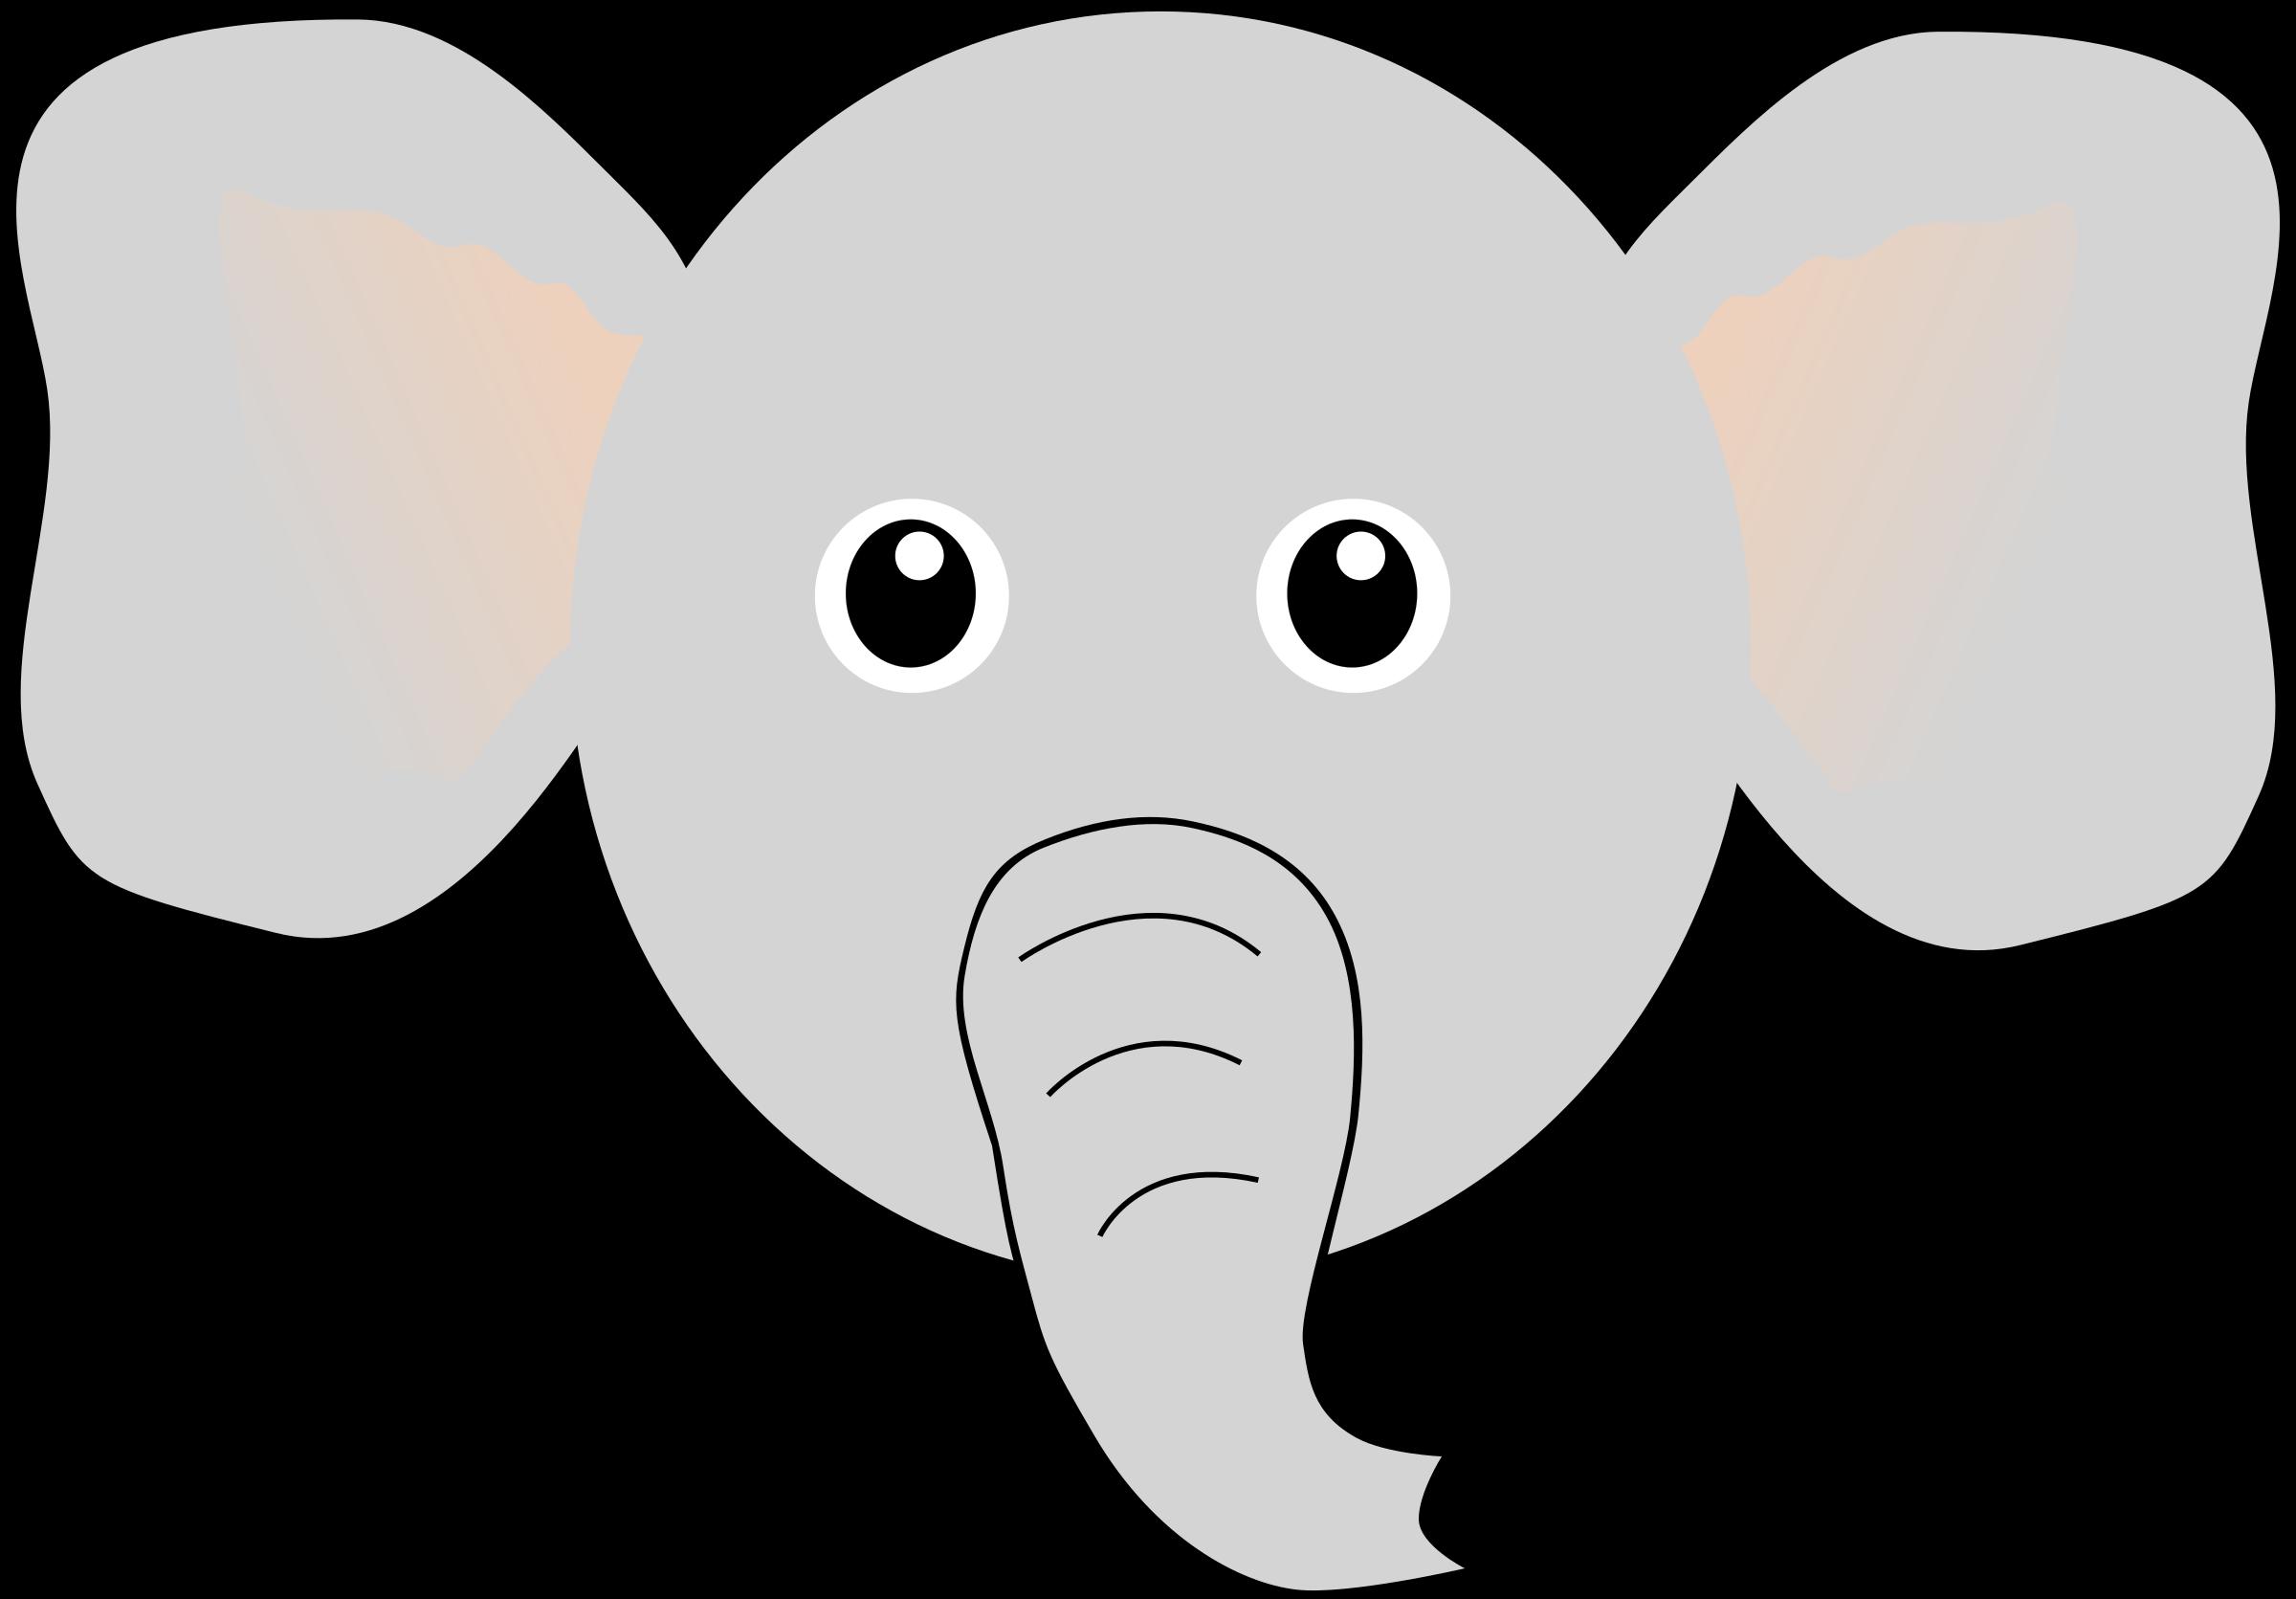 Clipart elephant face. Funny cartoon big image